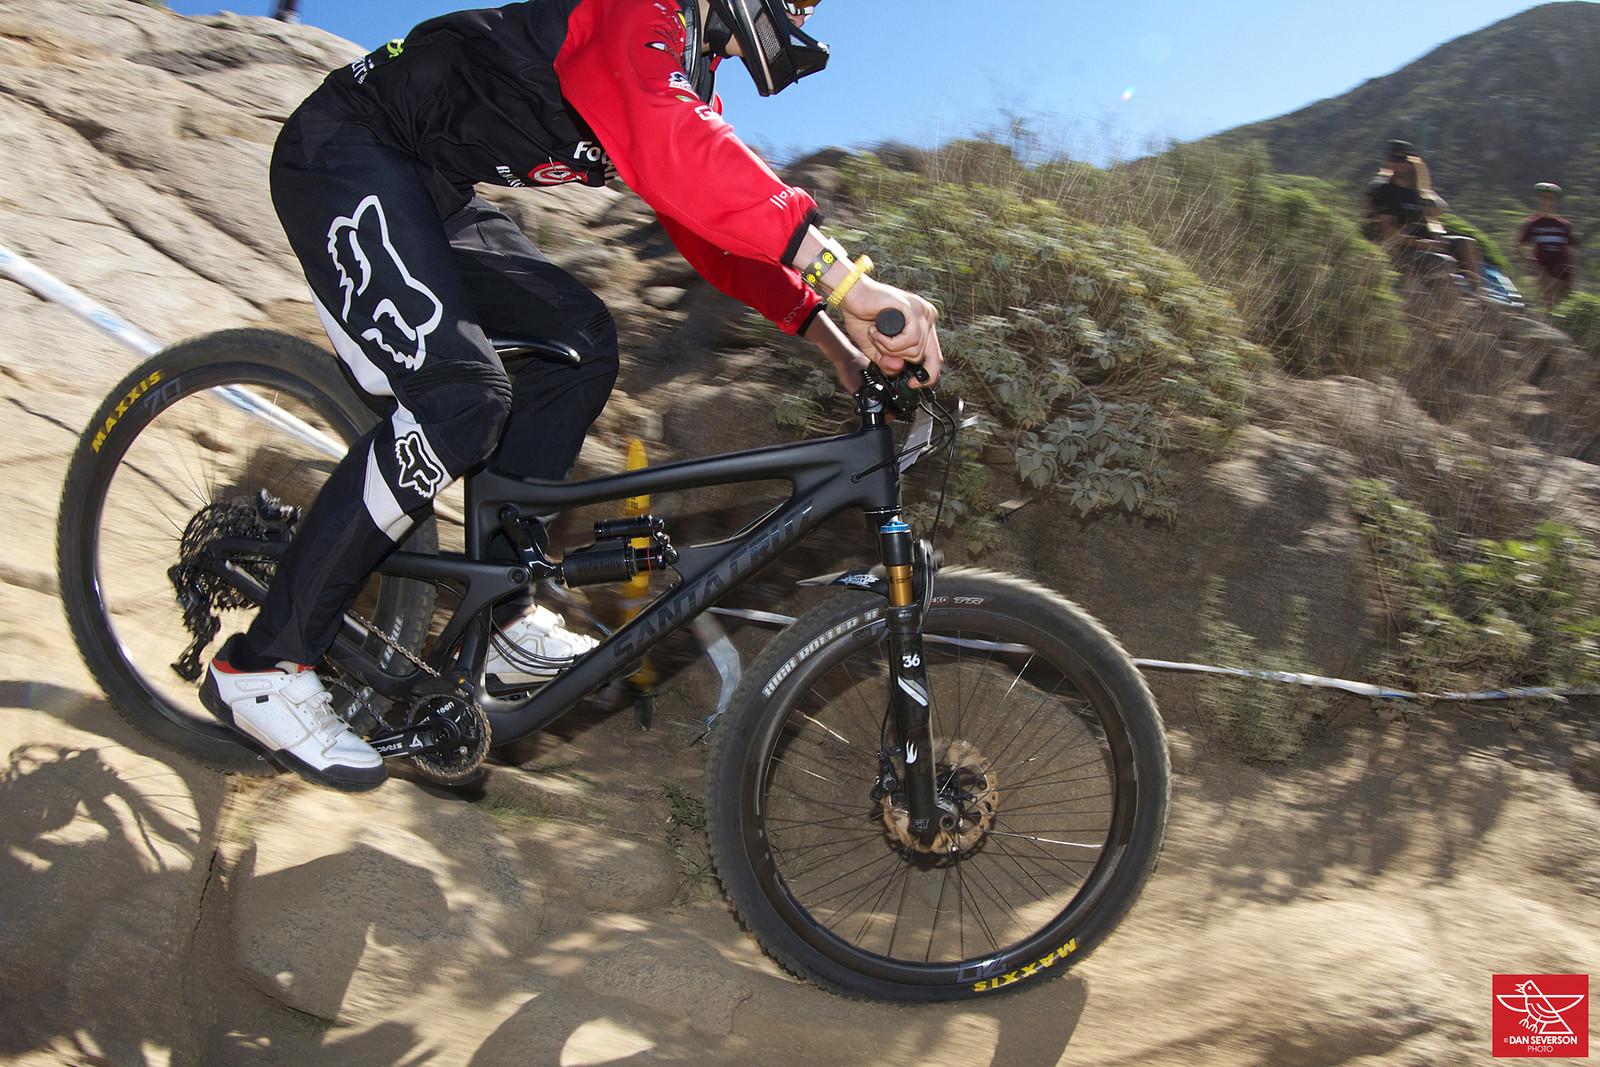 G-Out Project: Fontana 2015 - Santa Cruz Nomad - danseverson photo - Mountain Biking Pictures - Vital MTB